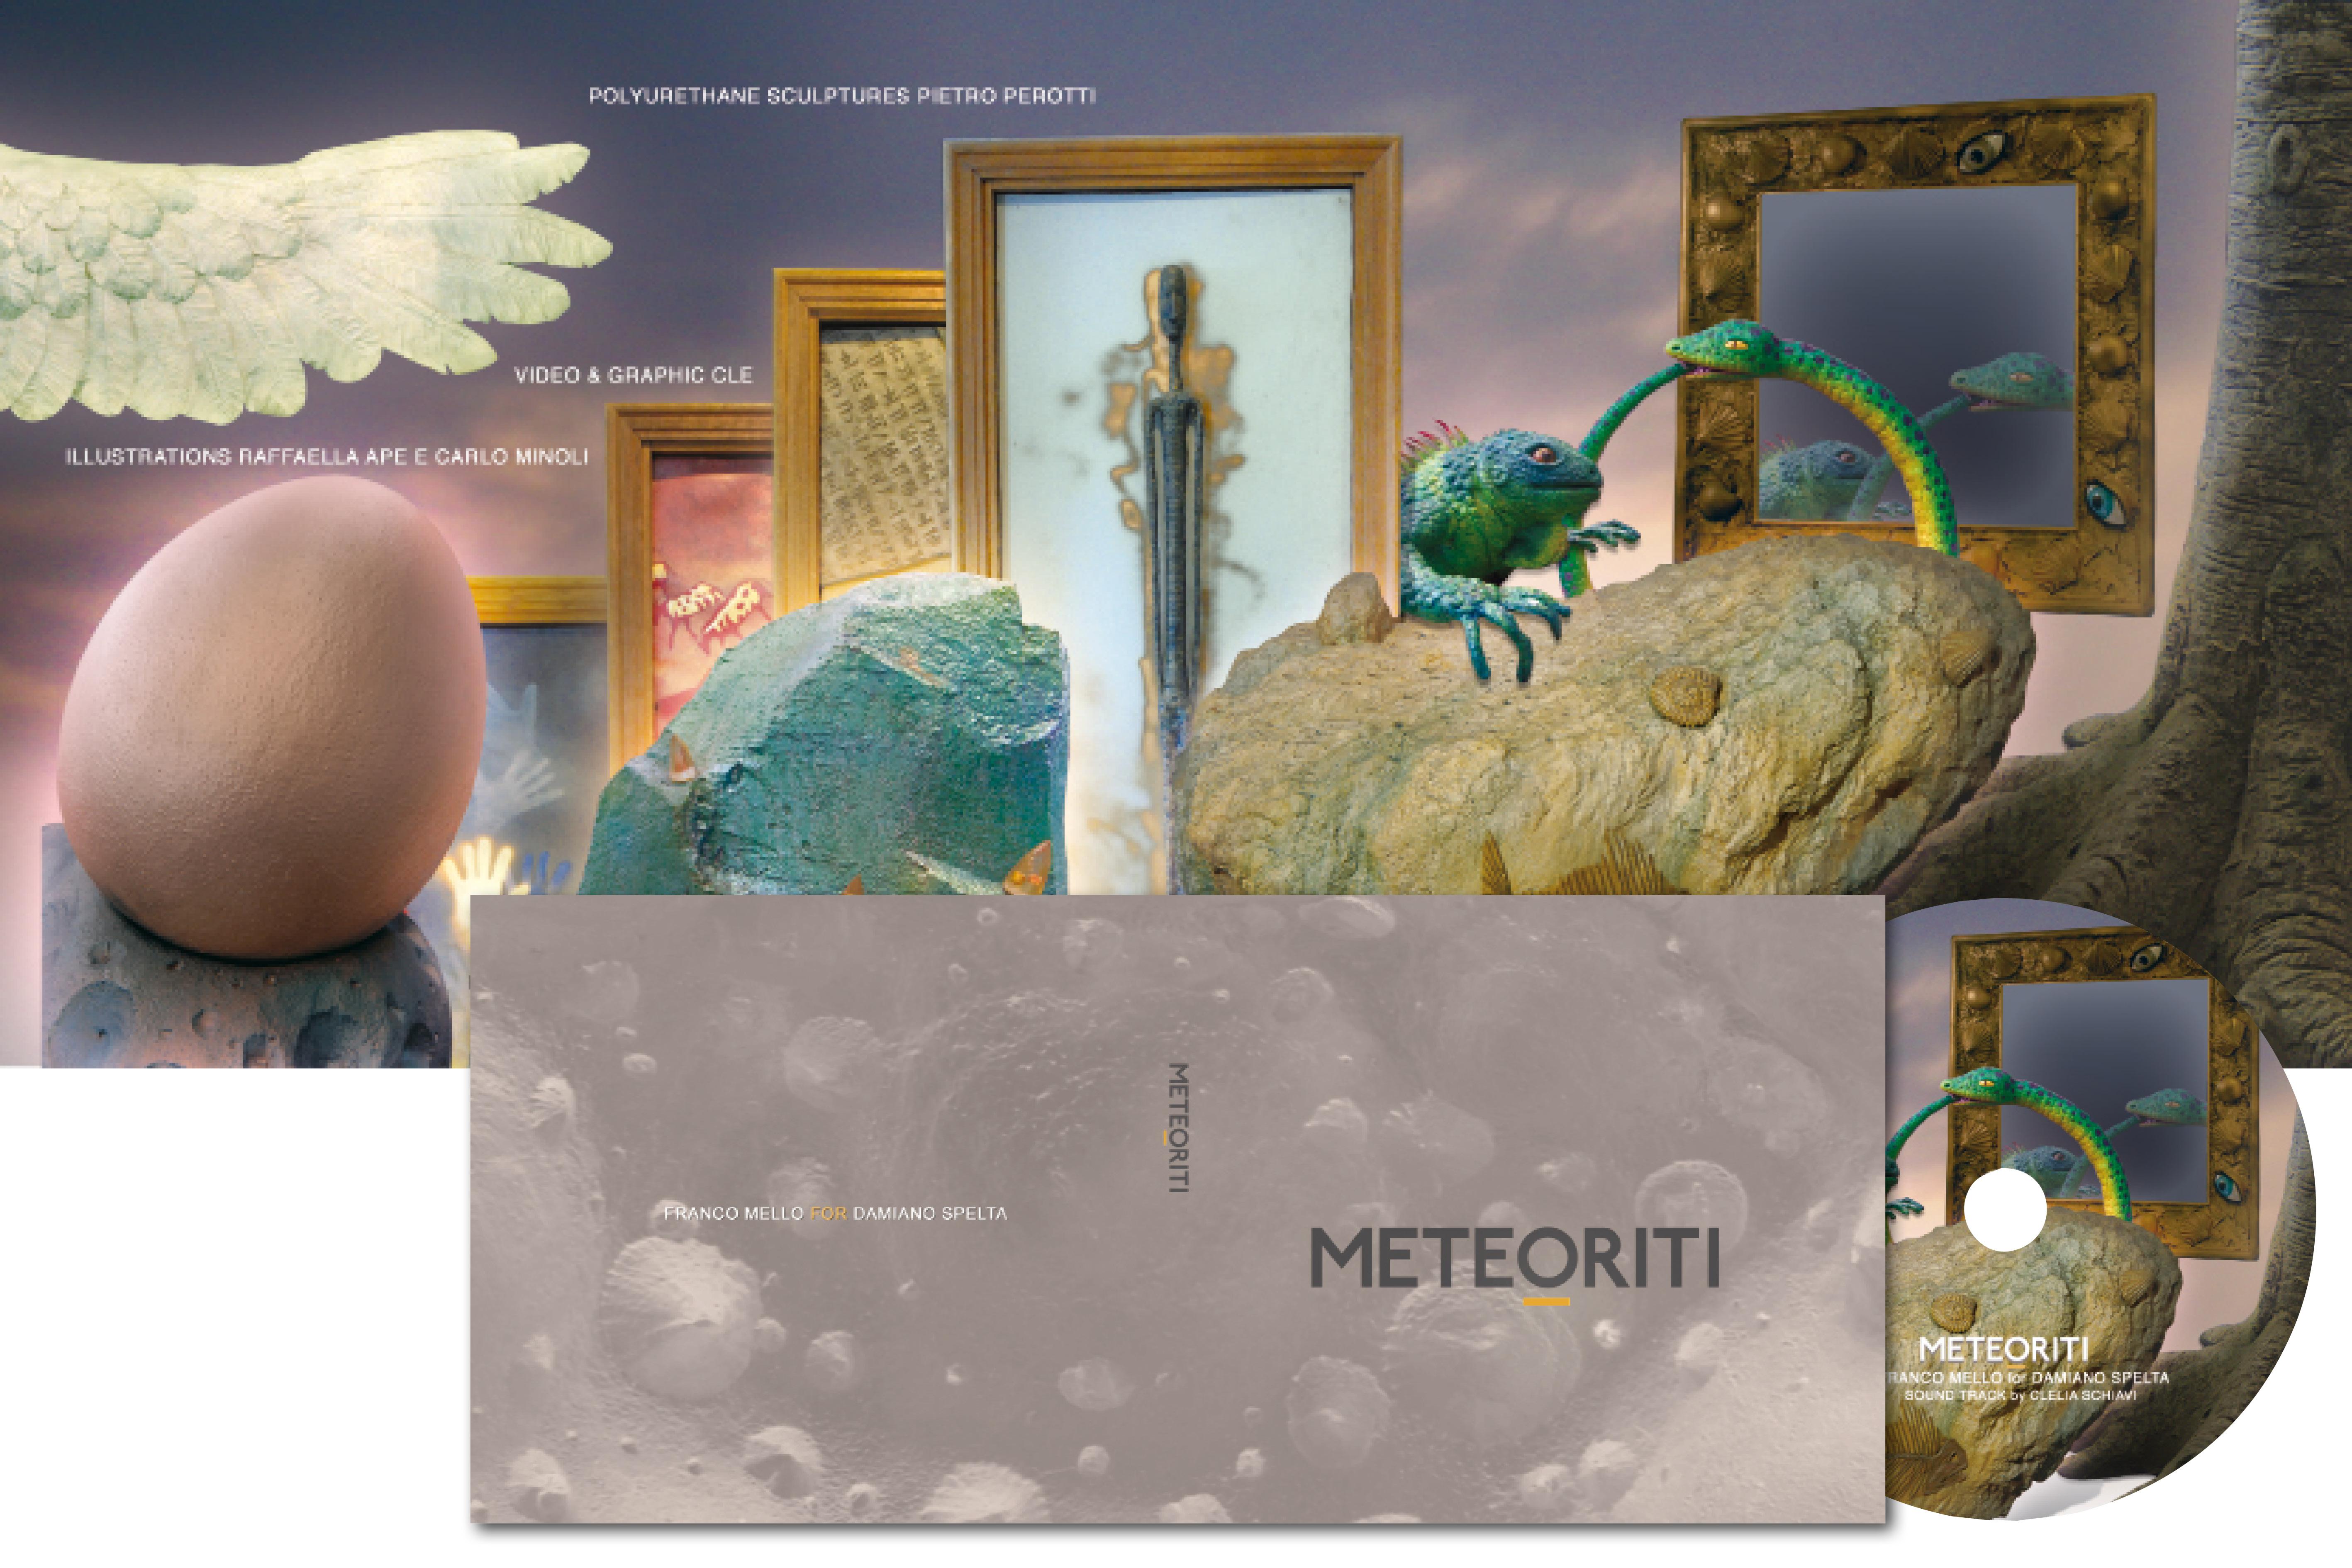 04 Meteoriti per Damiano Spelta